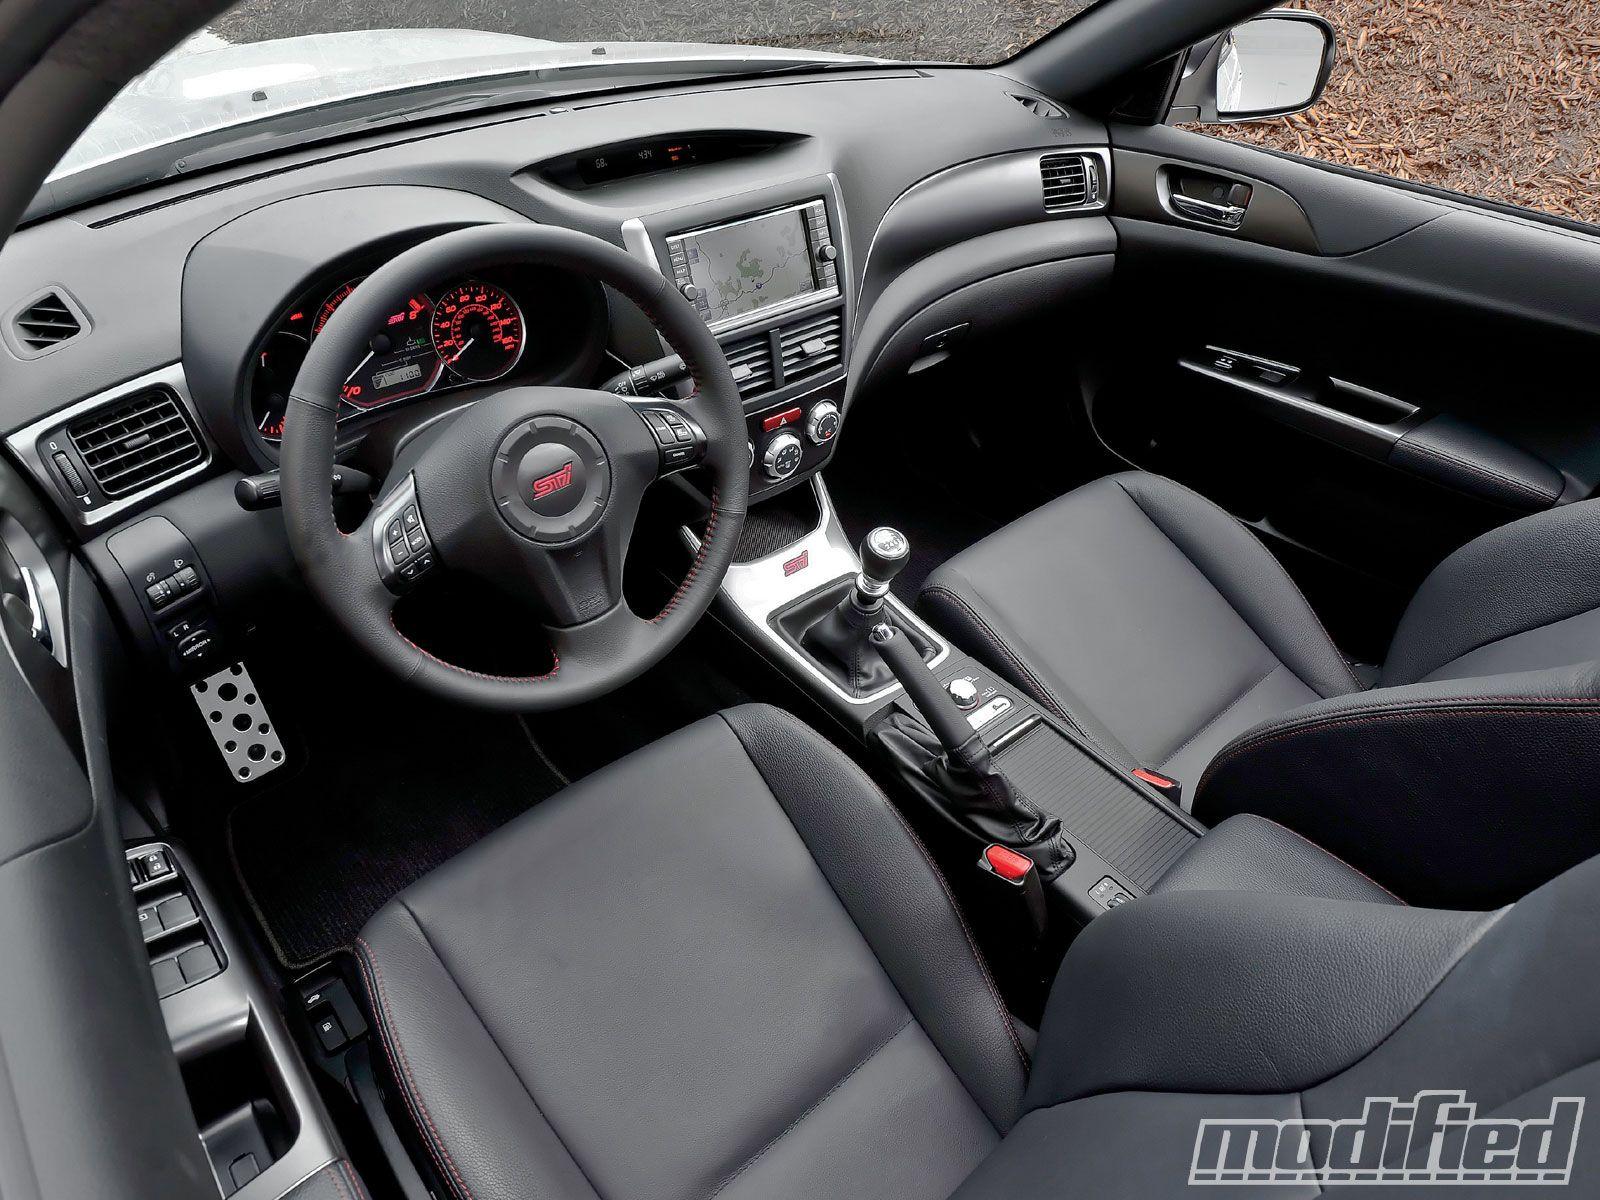 2011 Subaru Impreza Wrx Sti Interior Photo 3 2011 Subaru